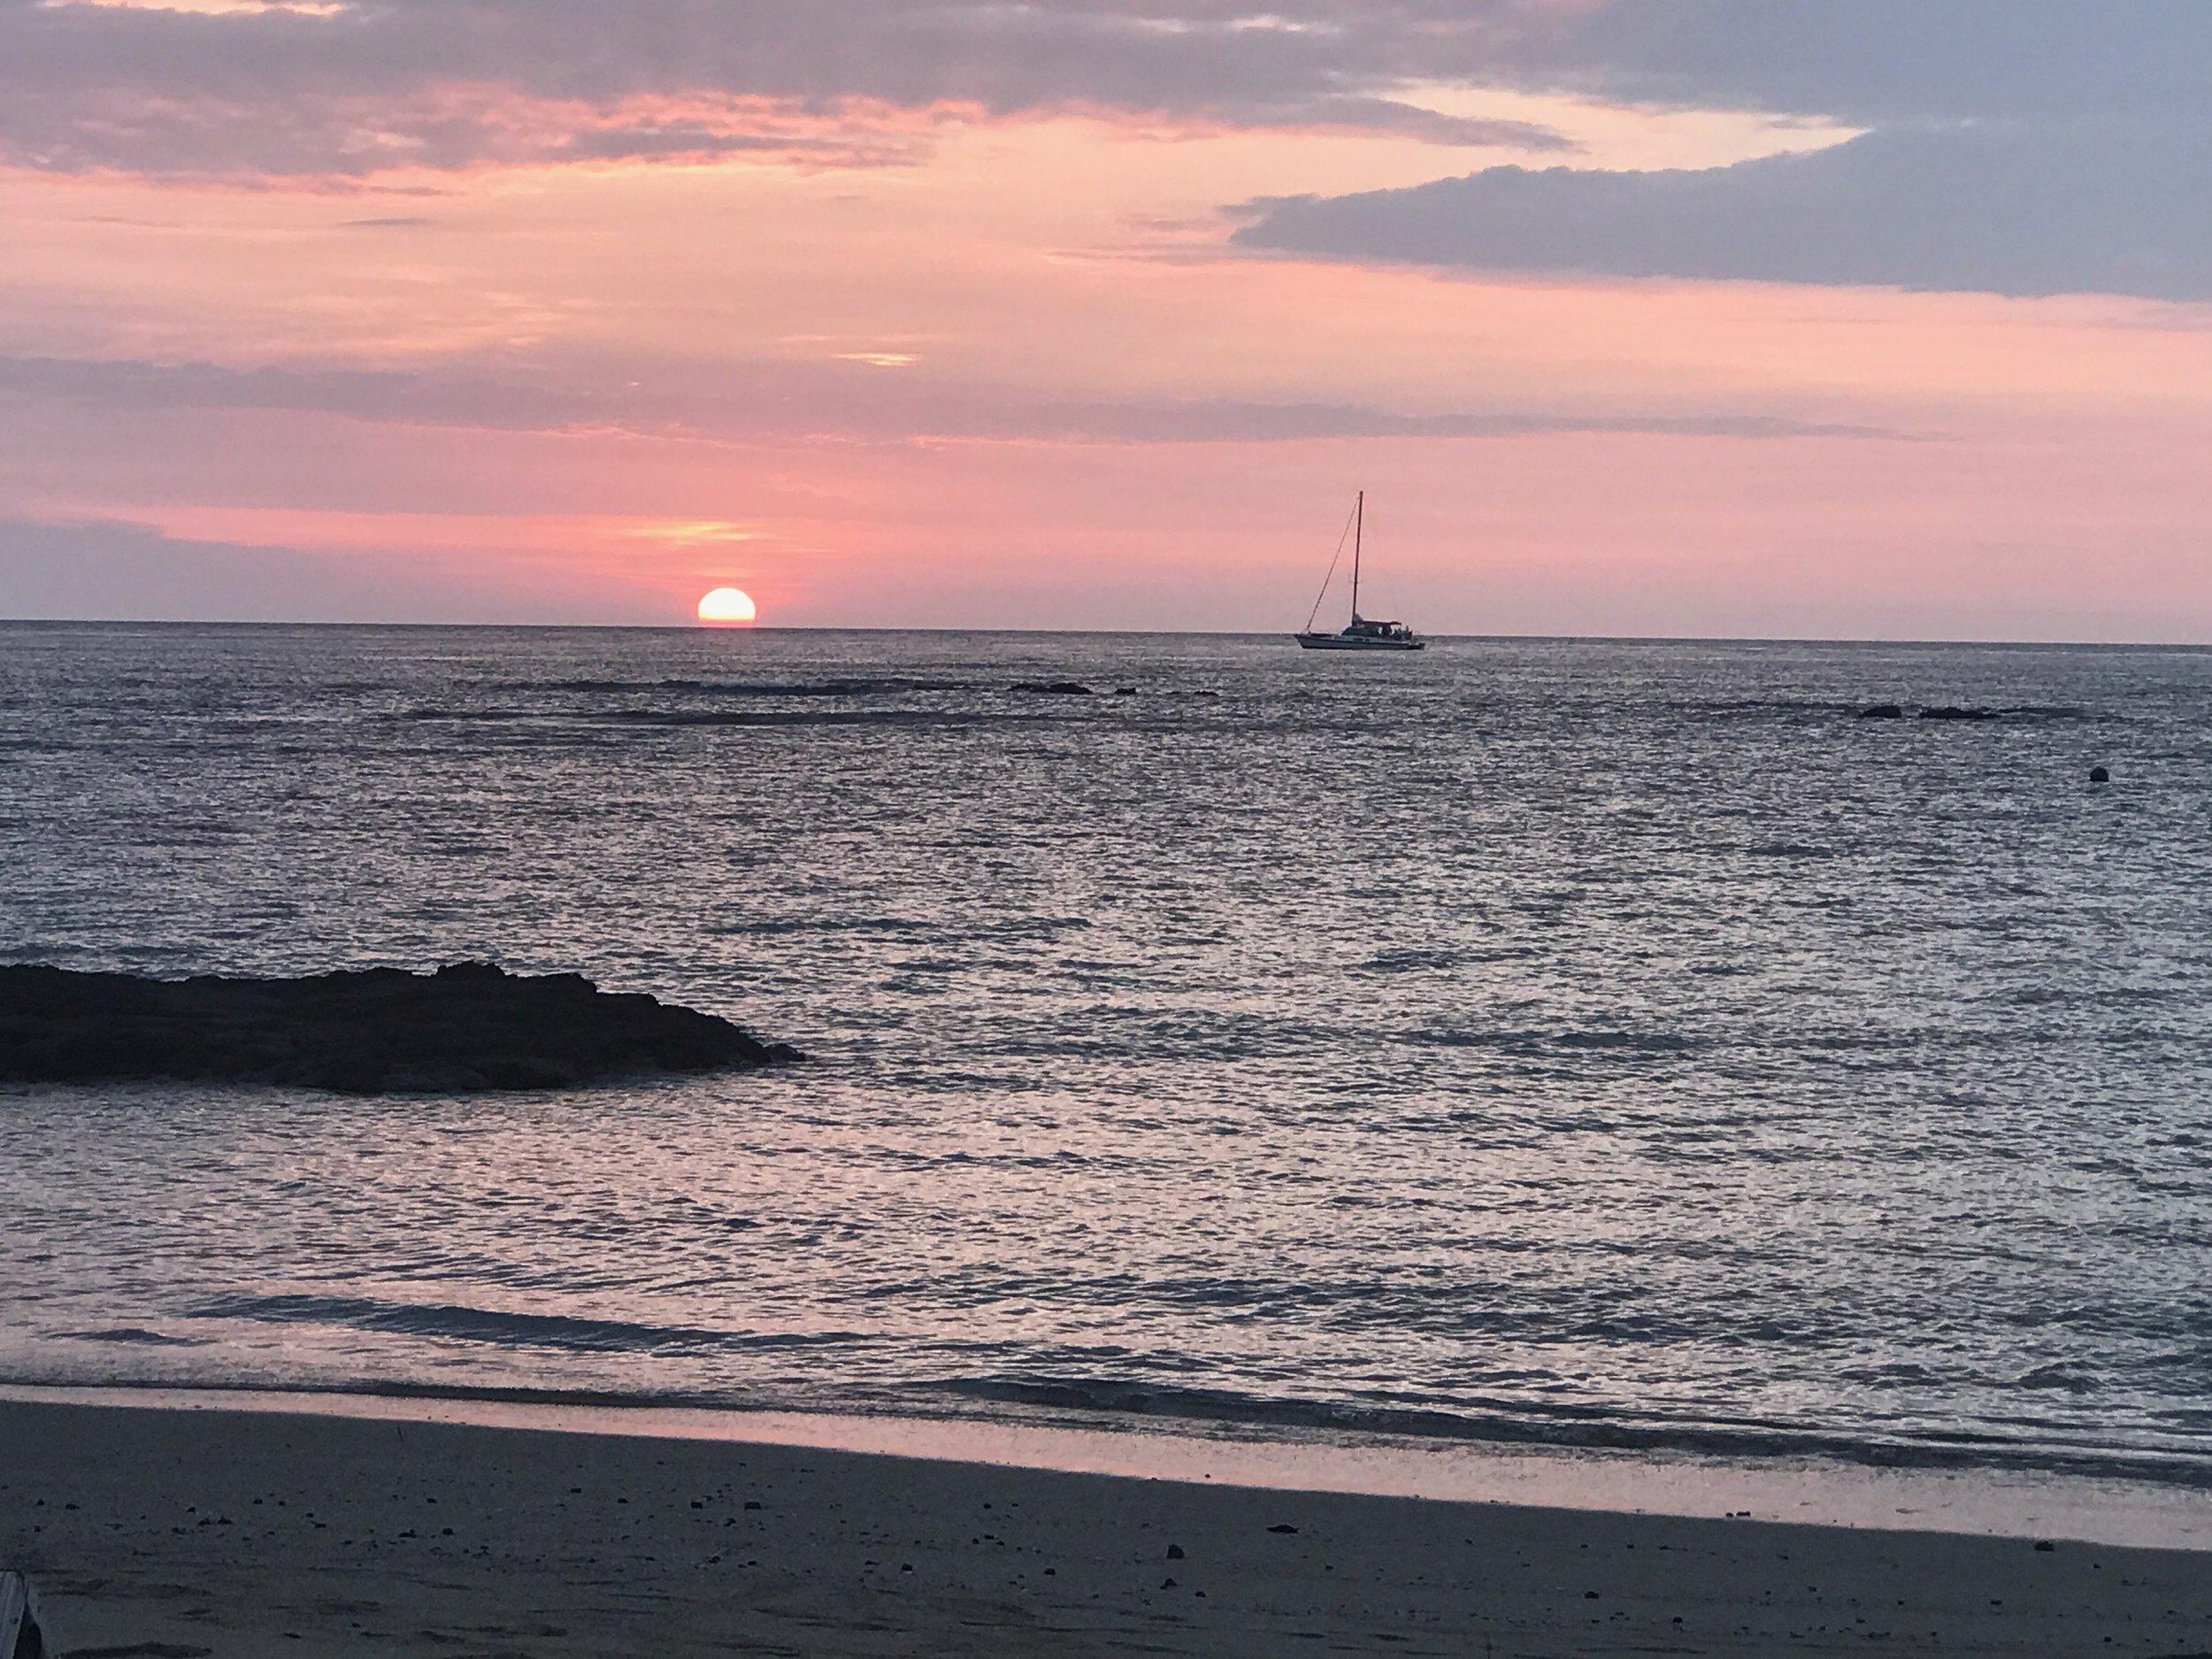 My last Hawai'ian sunset - until the next time.